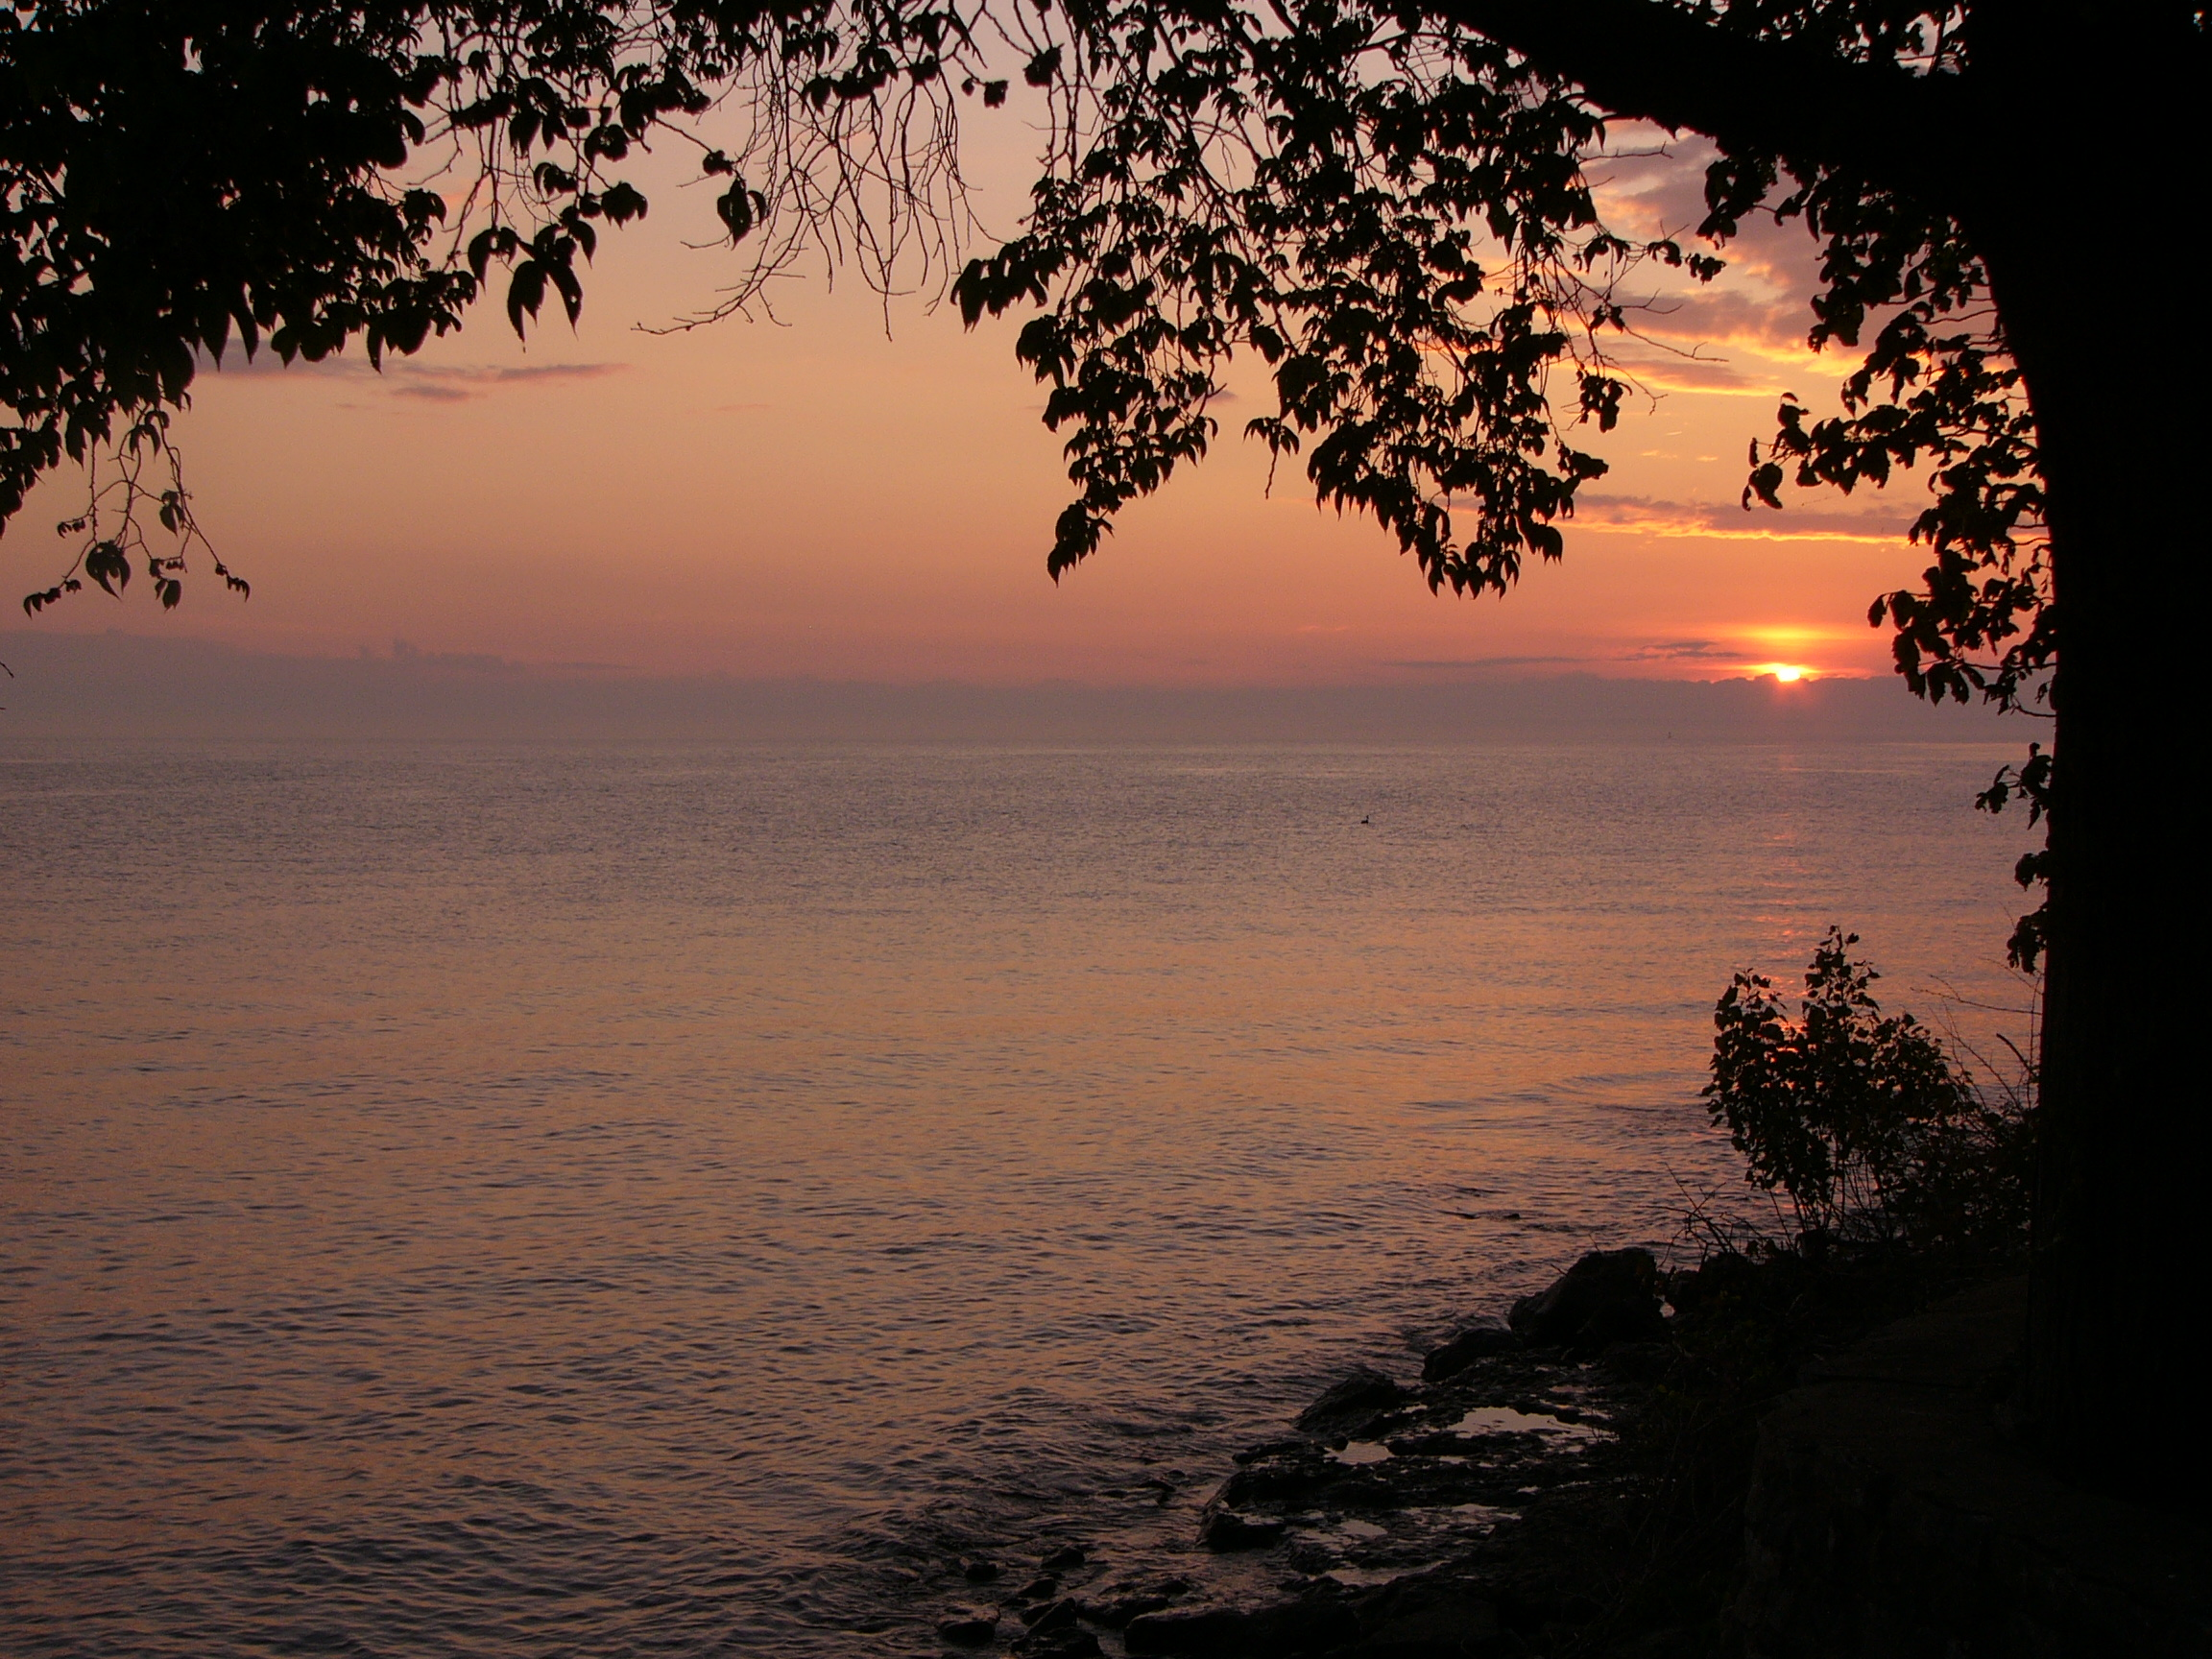 Sunset on Kelleys Island